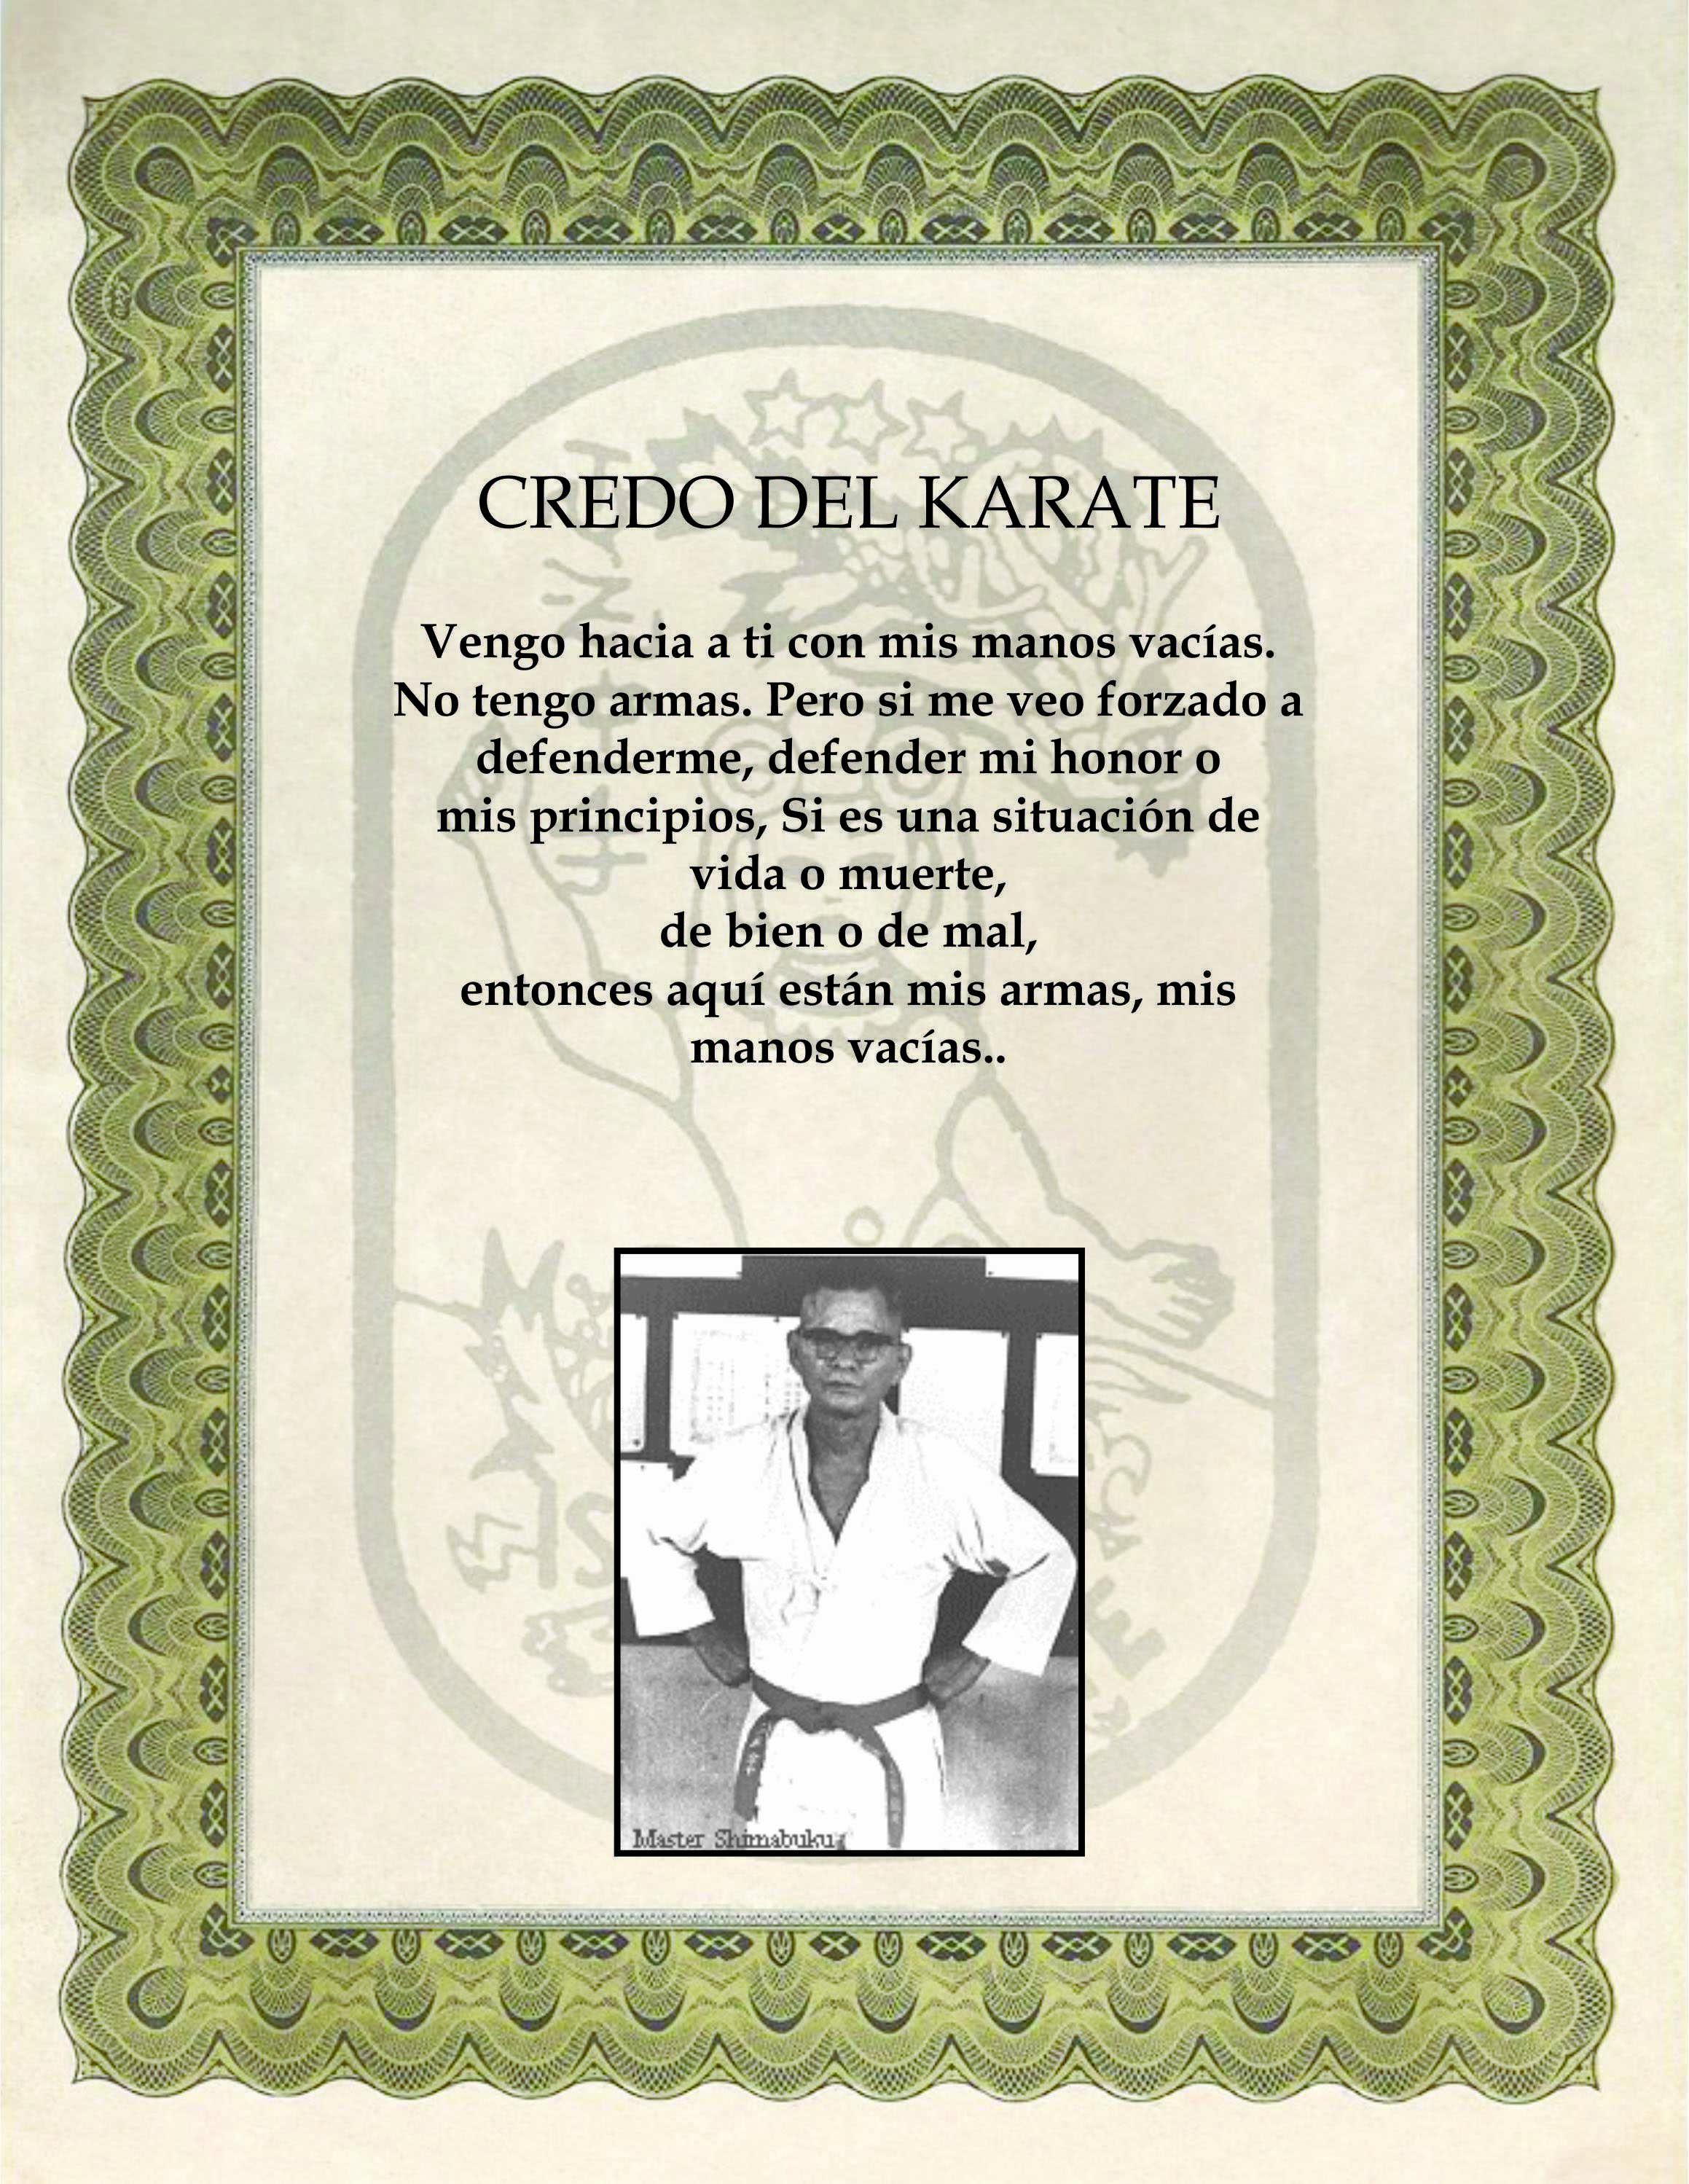 credo del karate como objeto inteligente-1